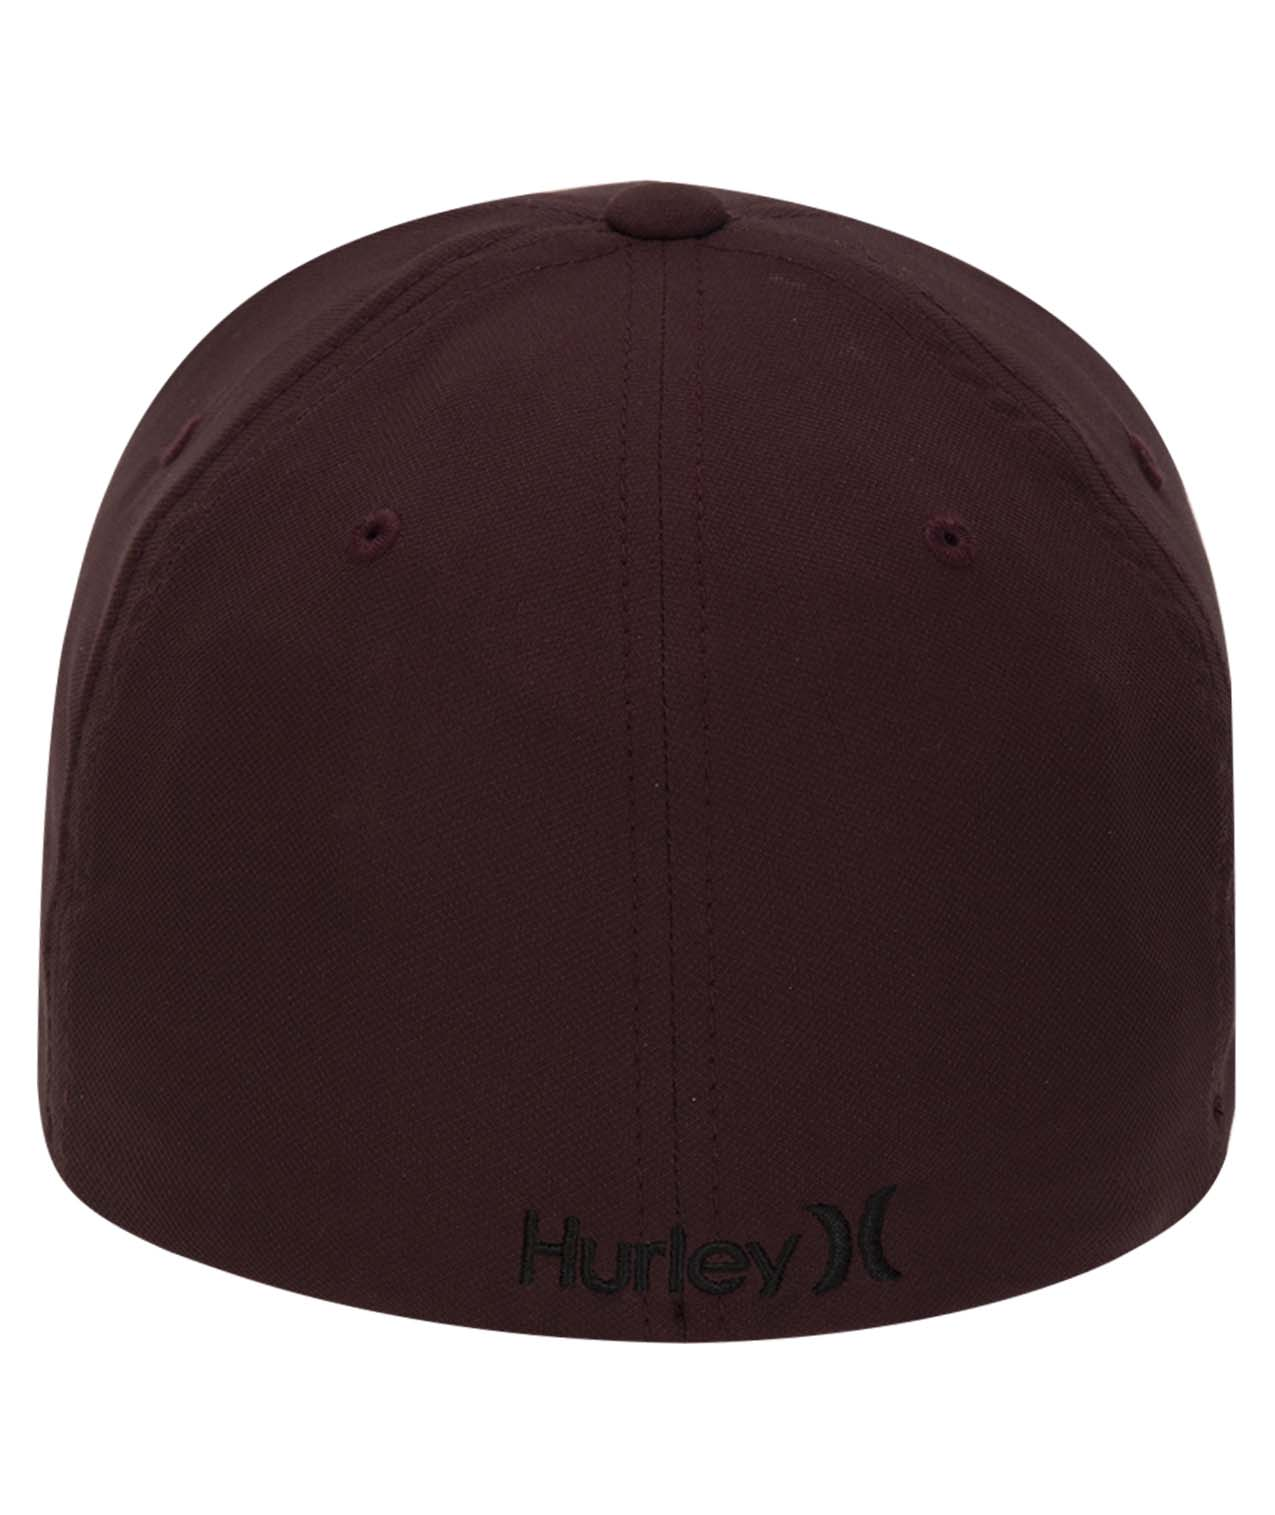 HURLEY DRI-FIT O&O 2.0 HAT